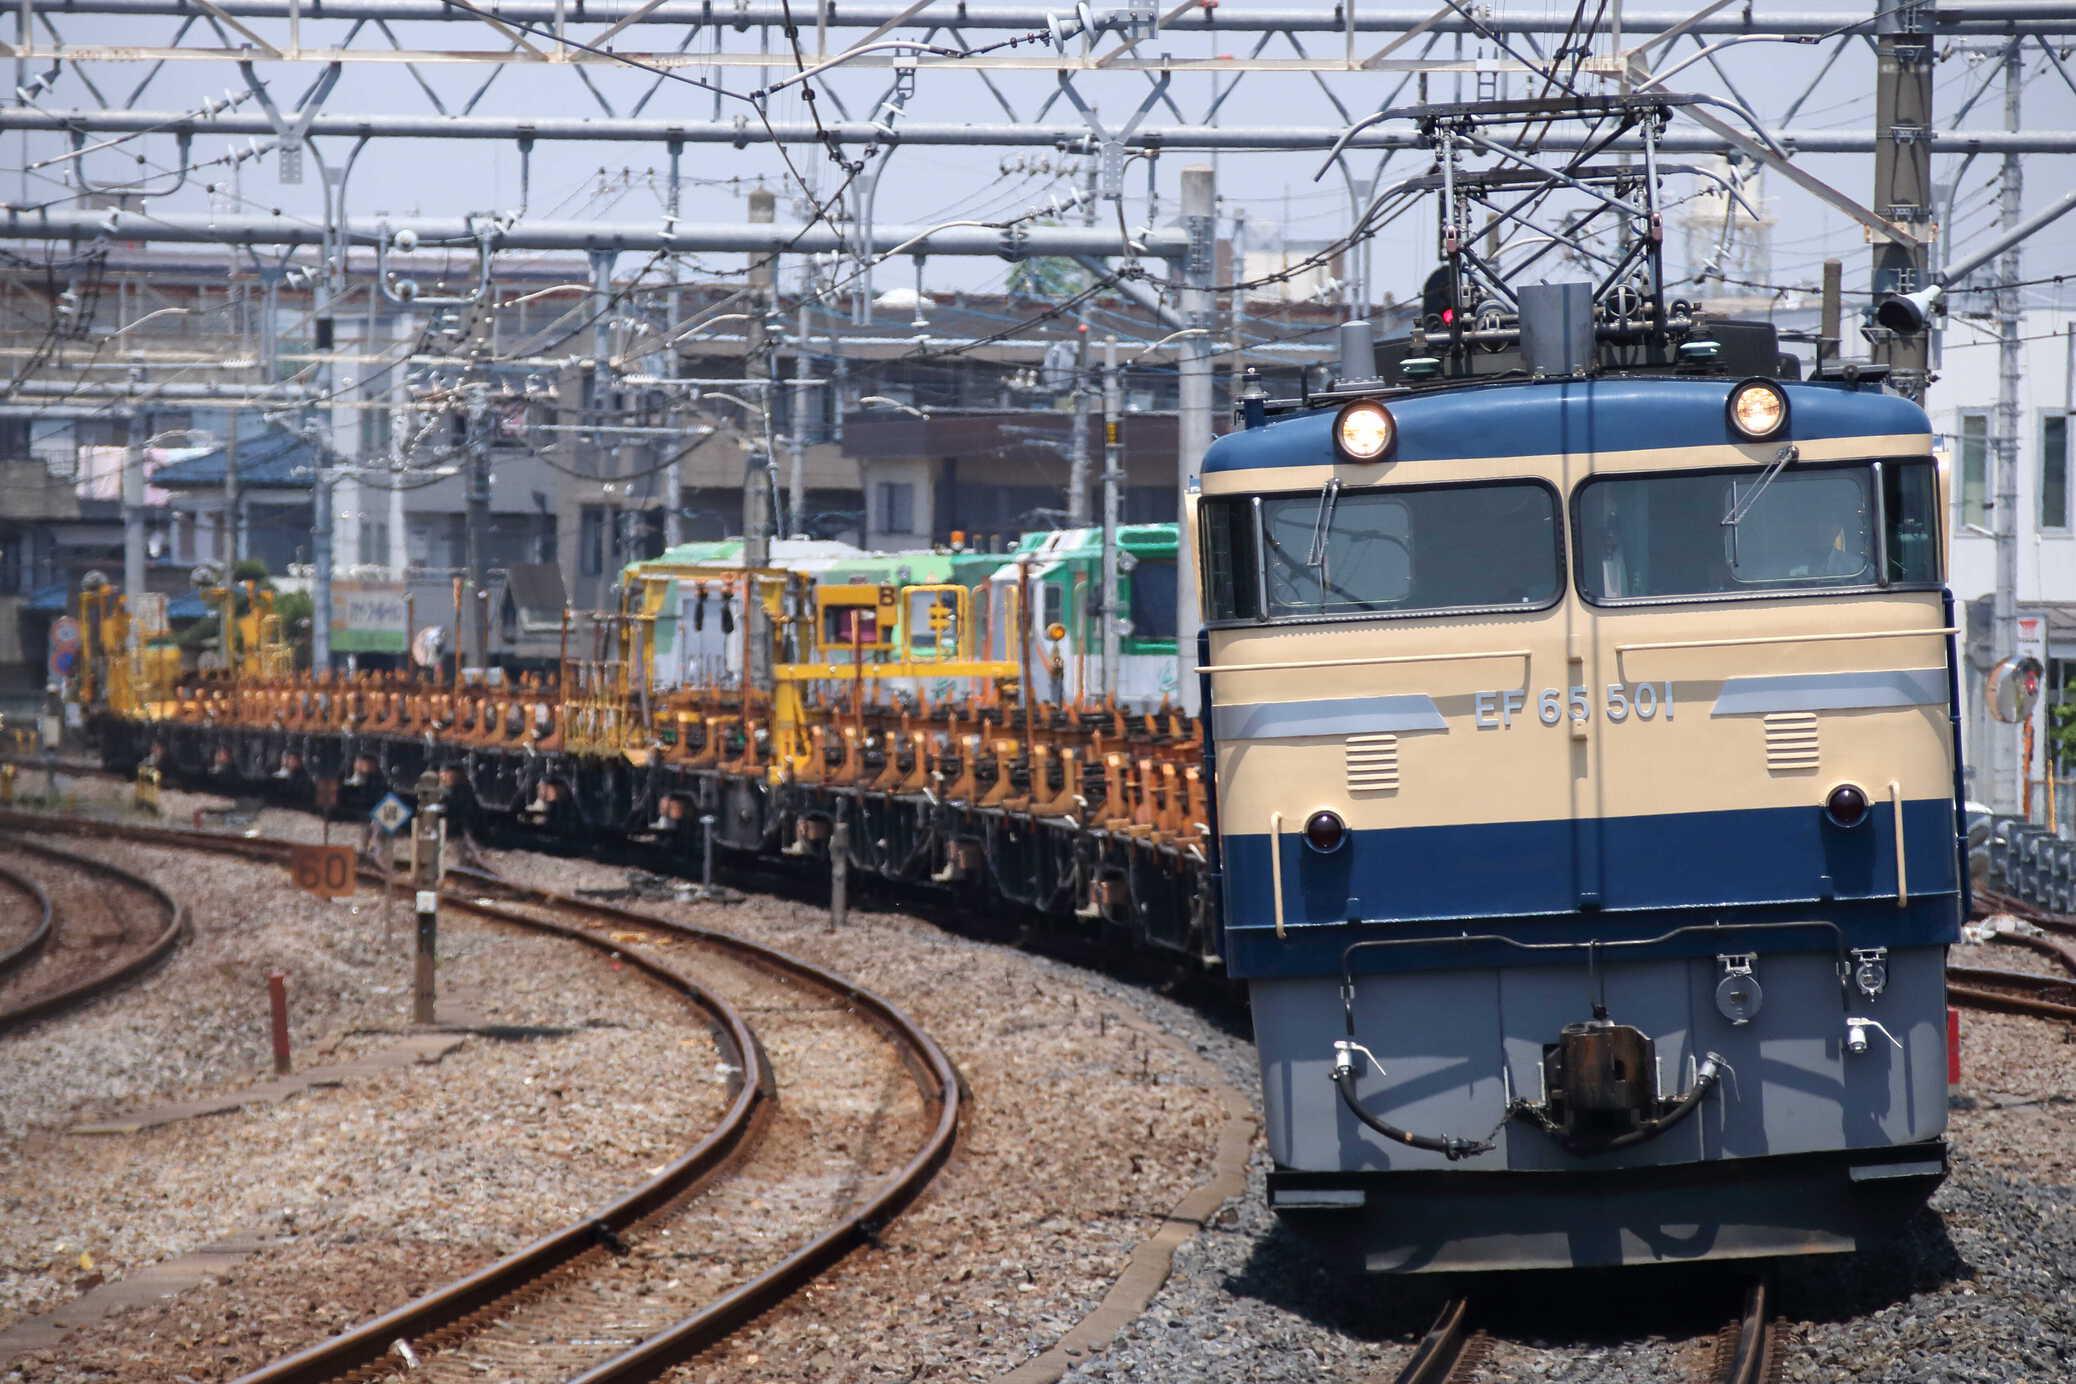 工9774列車 新津工臨返空(新北=2) EF65-501①[高]+ロンチキB編成13両